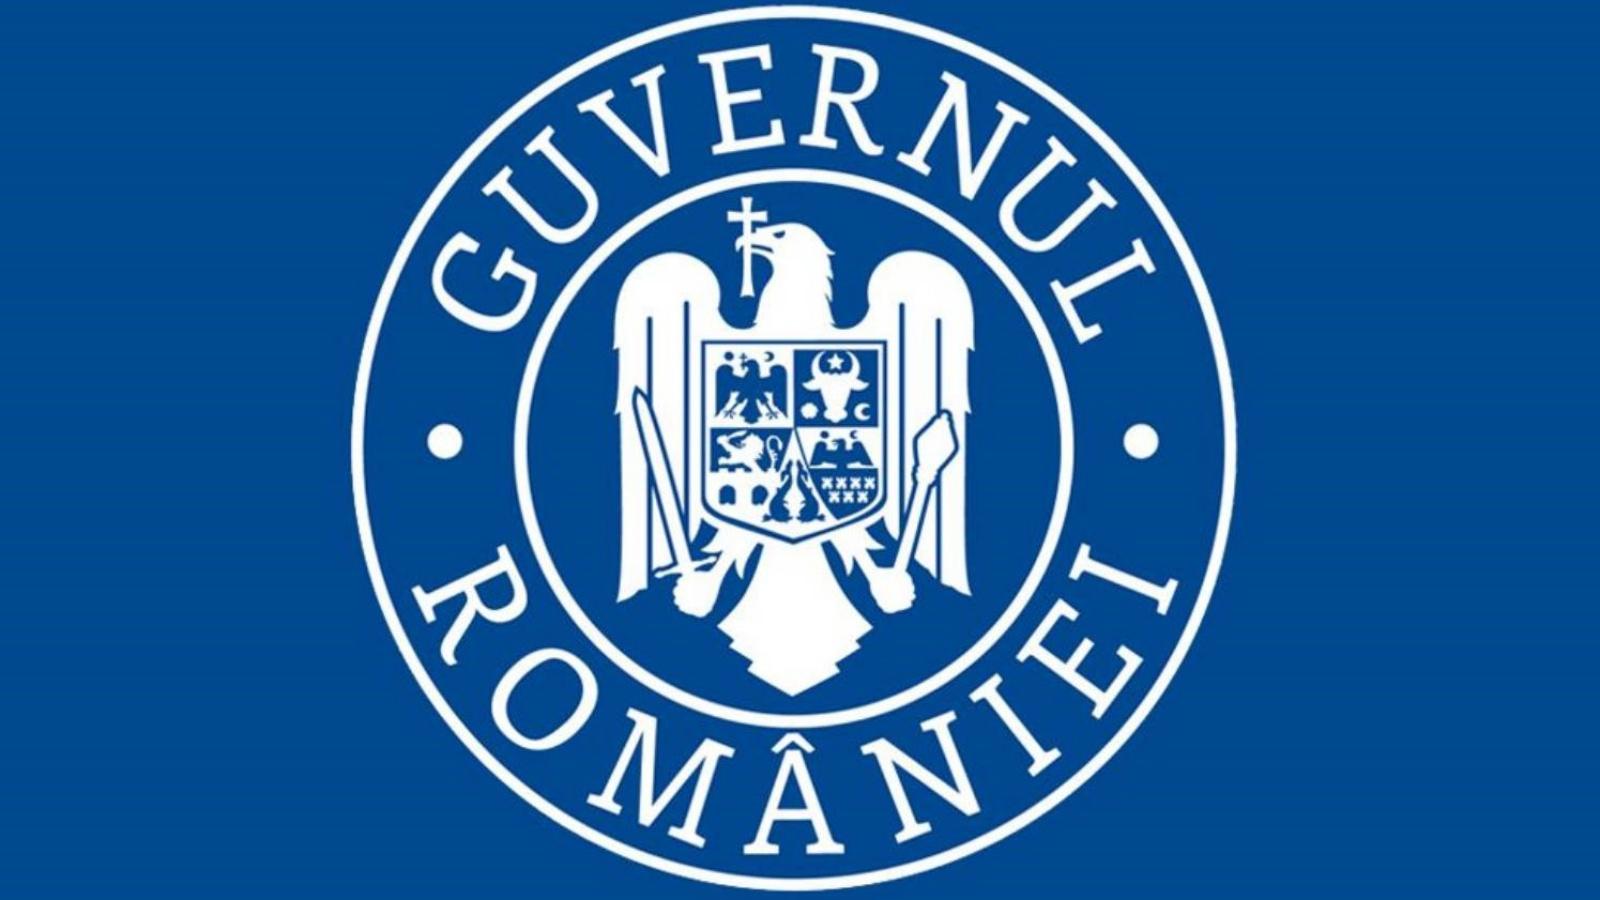 Alerta Guvernul Romaniei Amenintarile Online